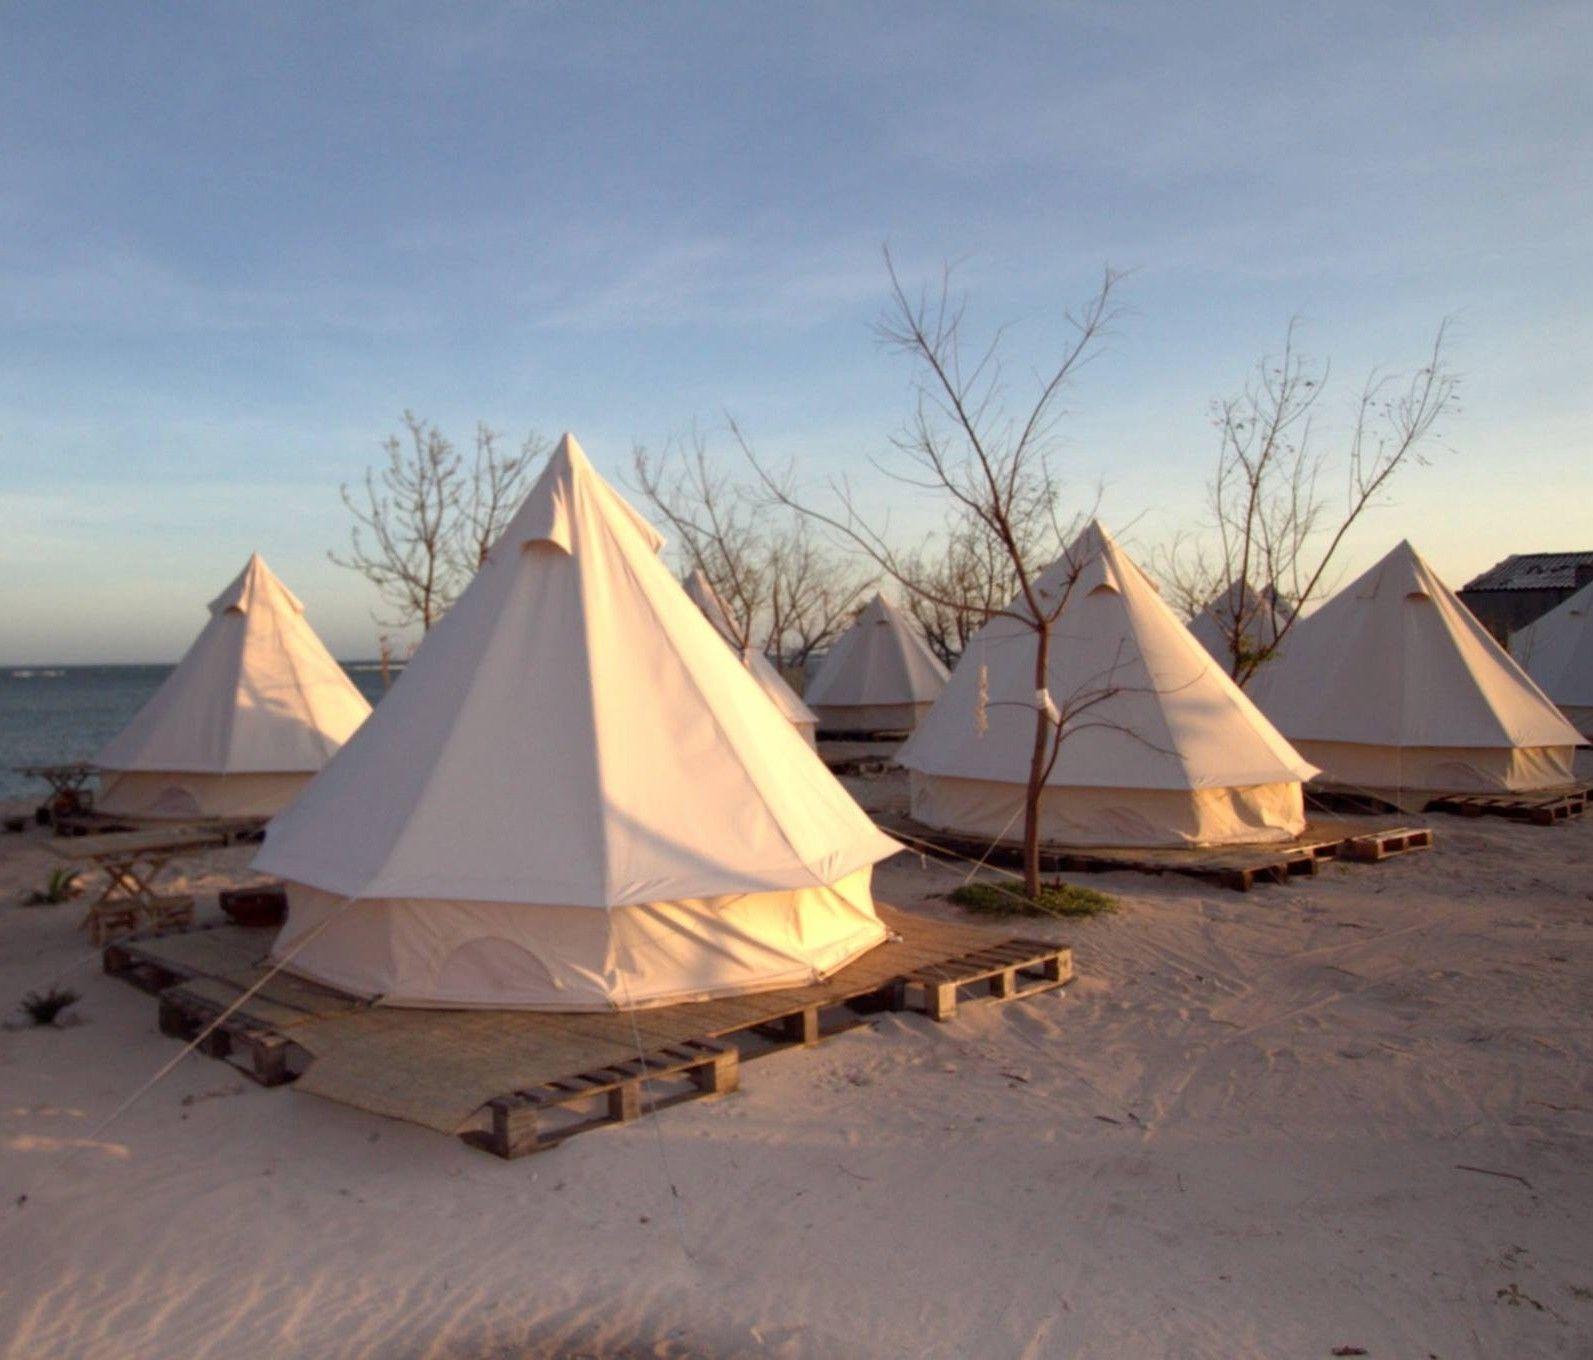 4-Season Waterproof Cotton Canvas Large Family C& Bell Tent Hunting Wall Tents | eBay & 4-Season Waterproof Cotton Canvas Bell Tent Large Family Camp ...